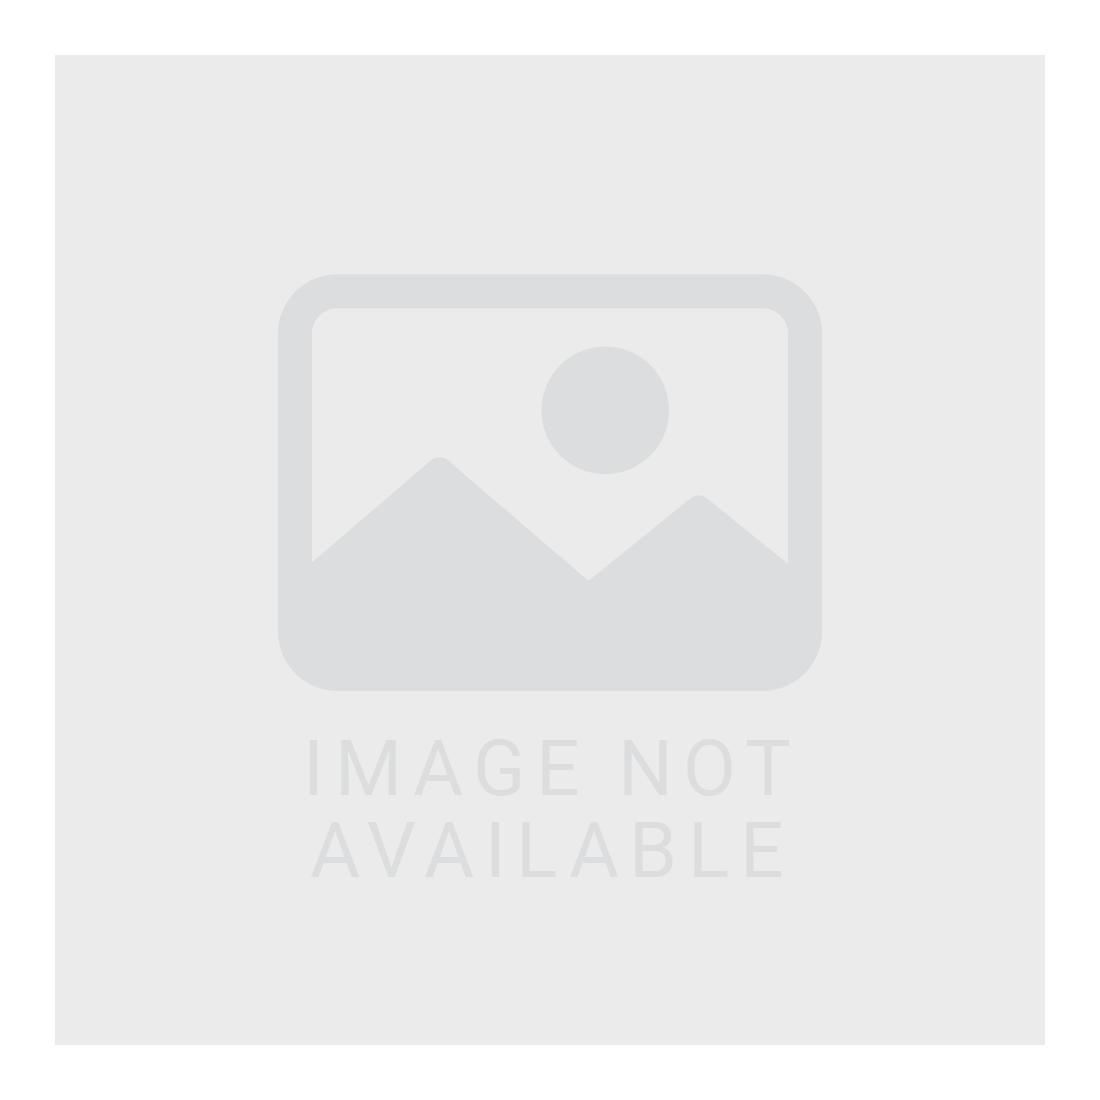 Vanpire Pacifica Halloween T-shirt